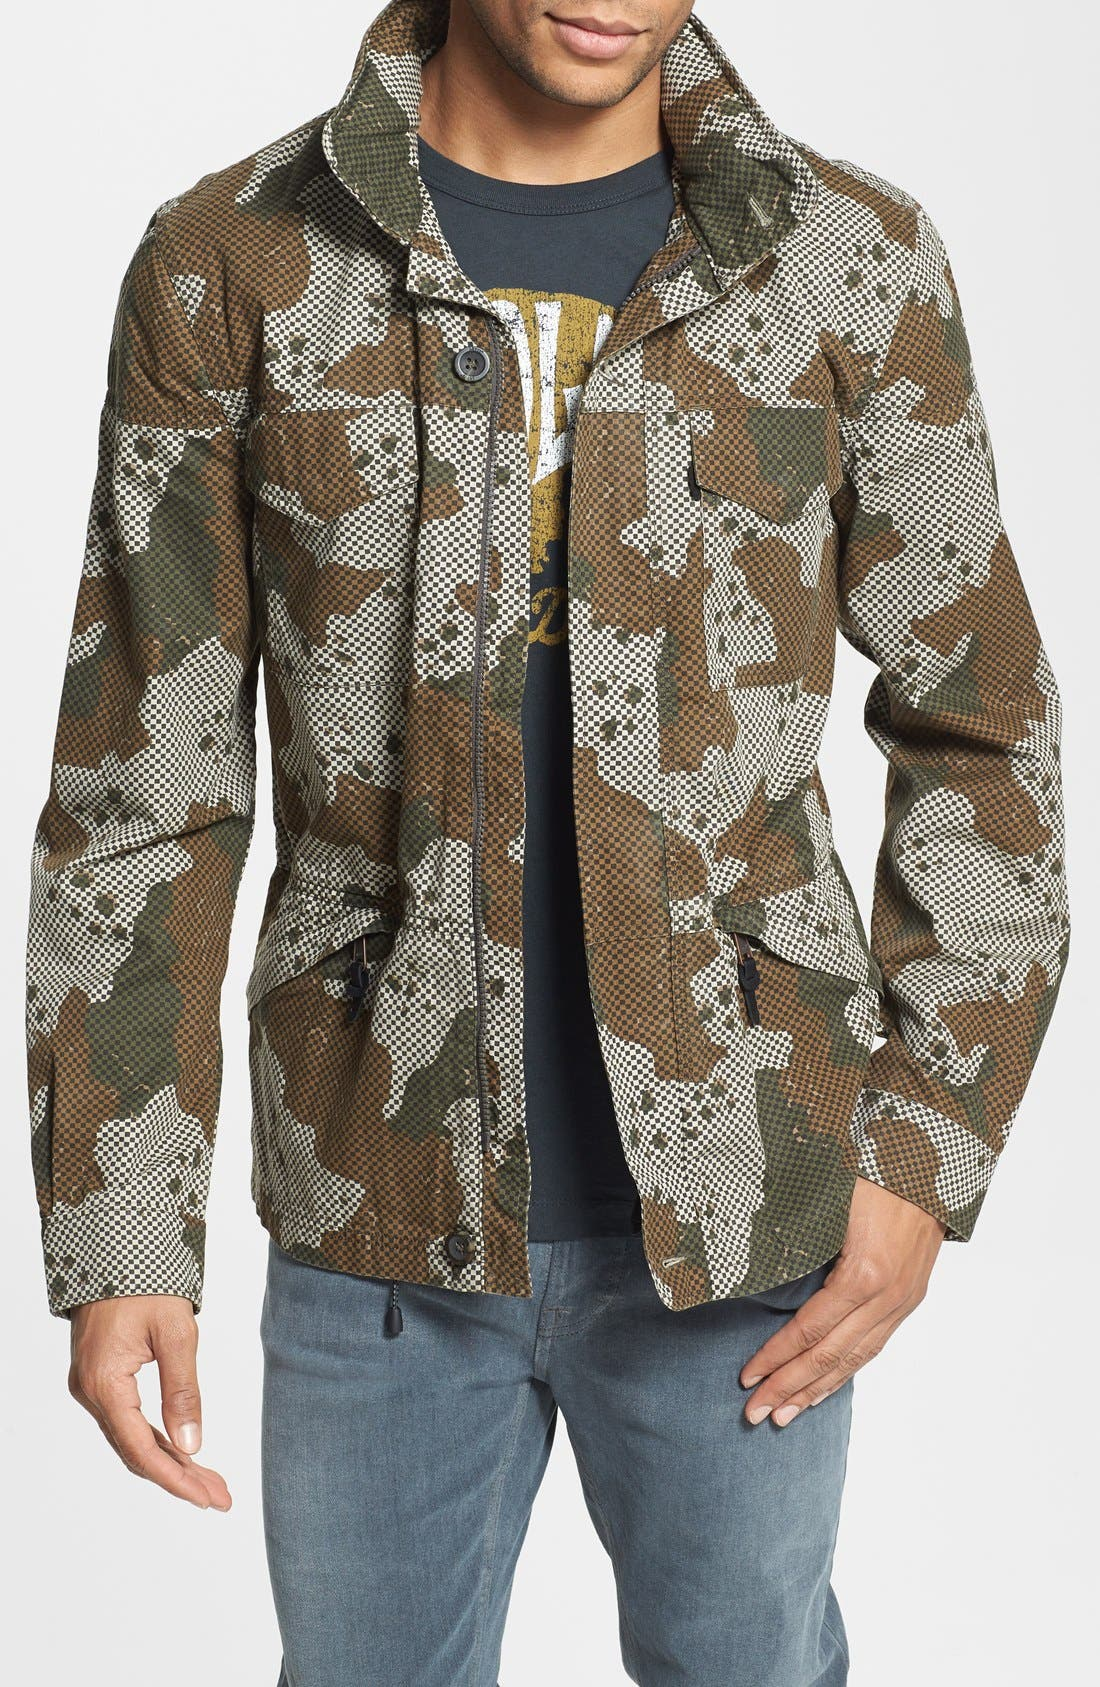 Main Image - Levi's® Check & Camo Print Field Jacket